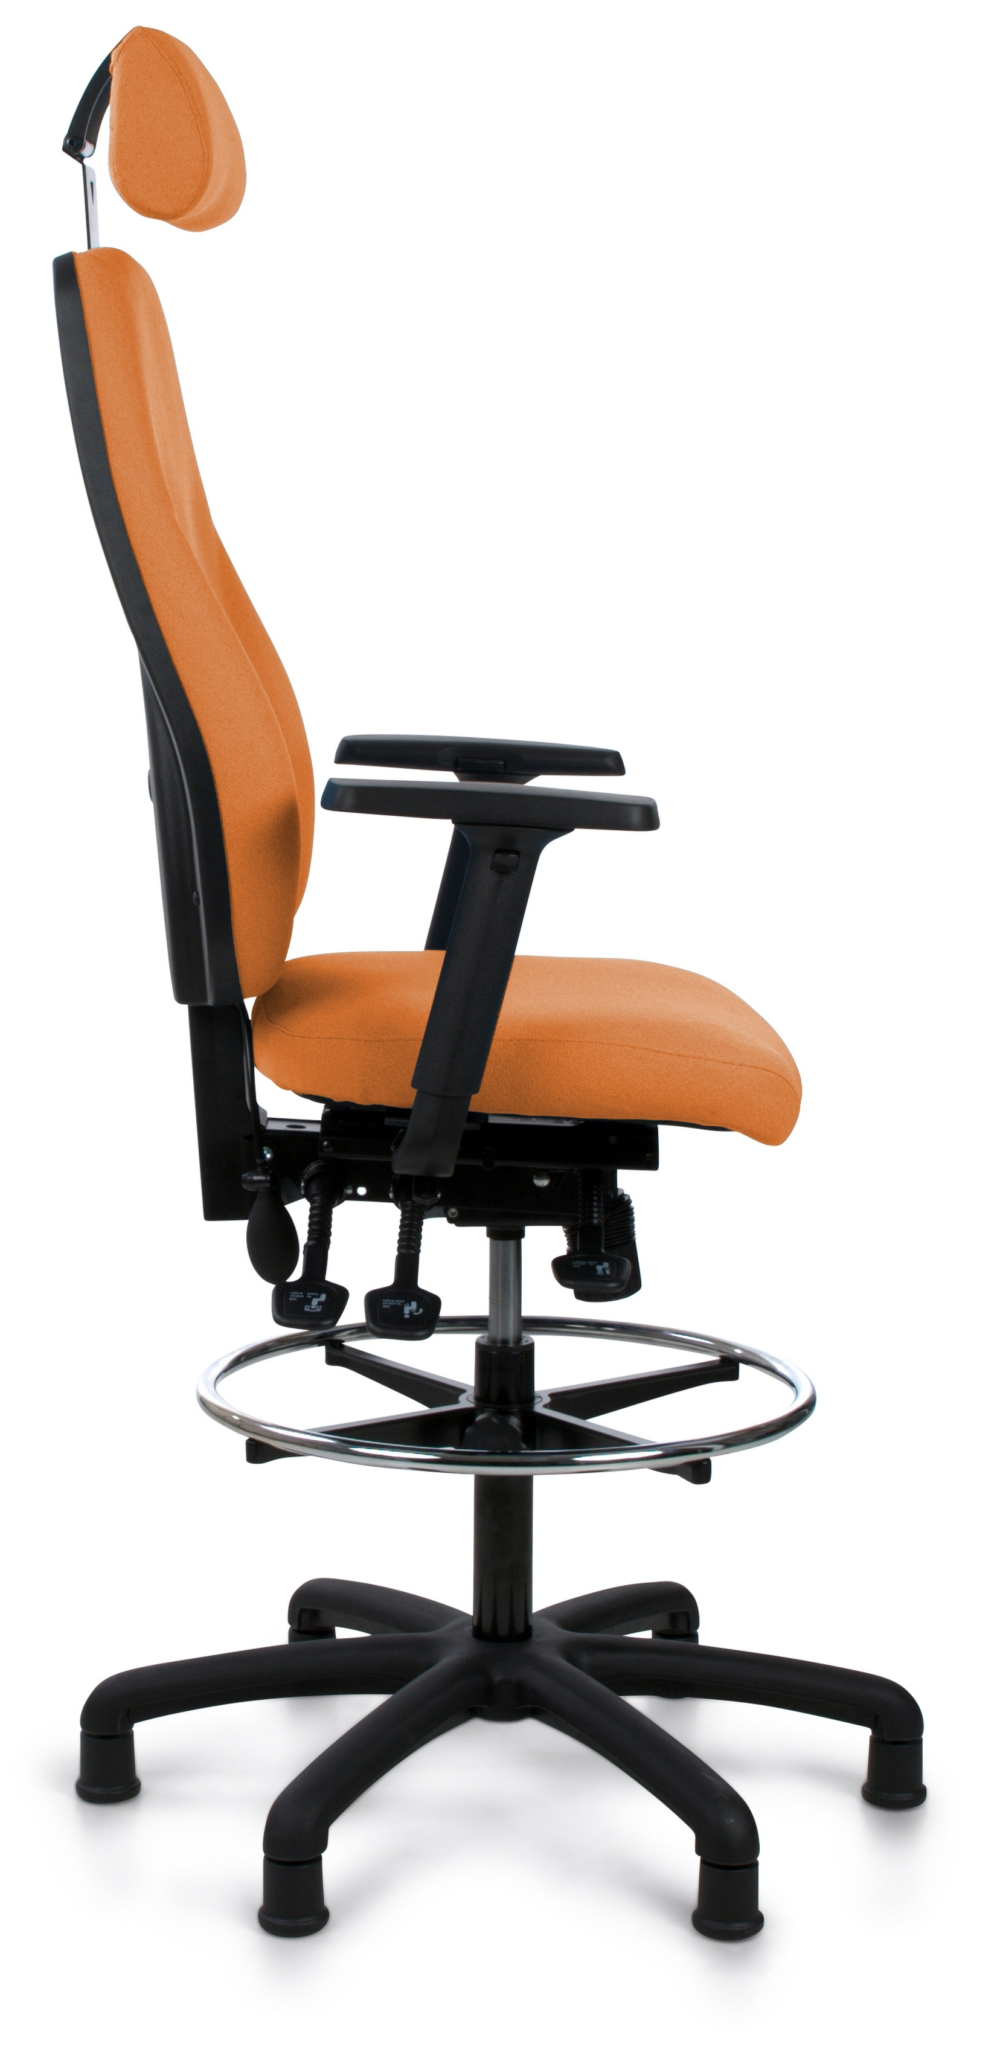 Opera 60 8 H Ergonomic fice Chair